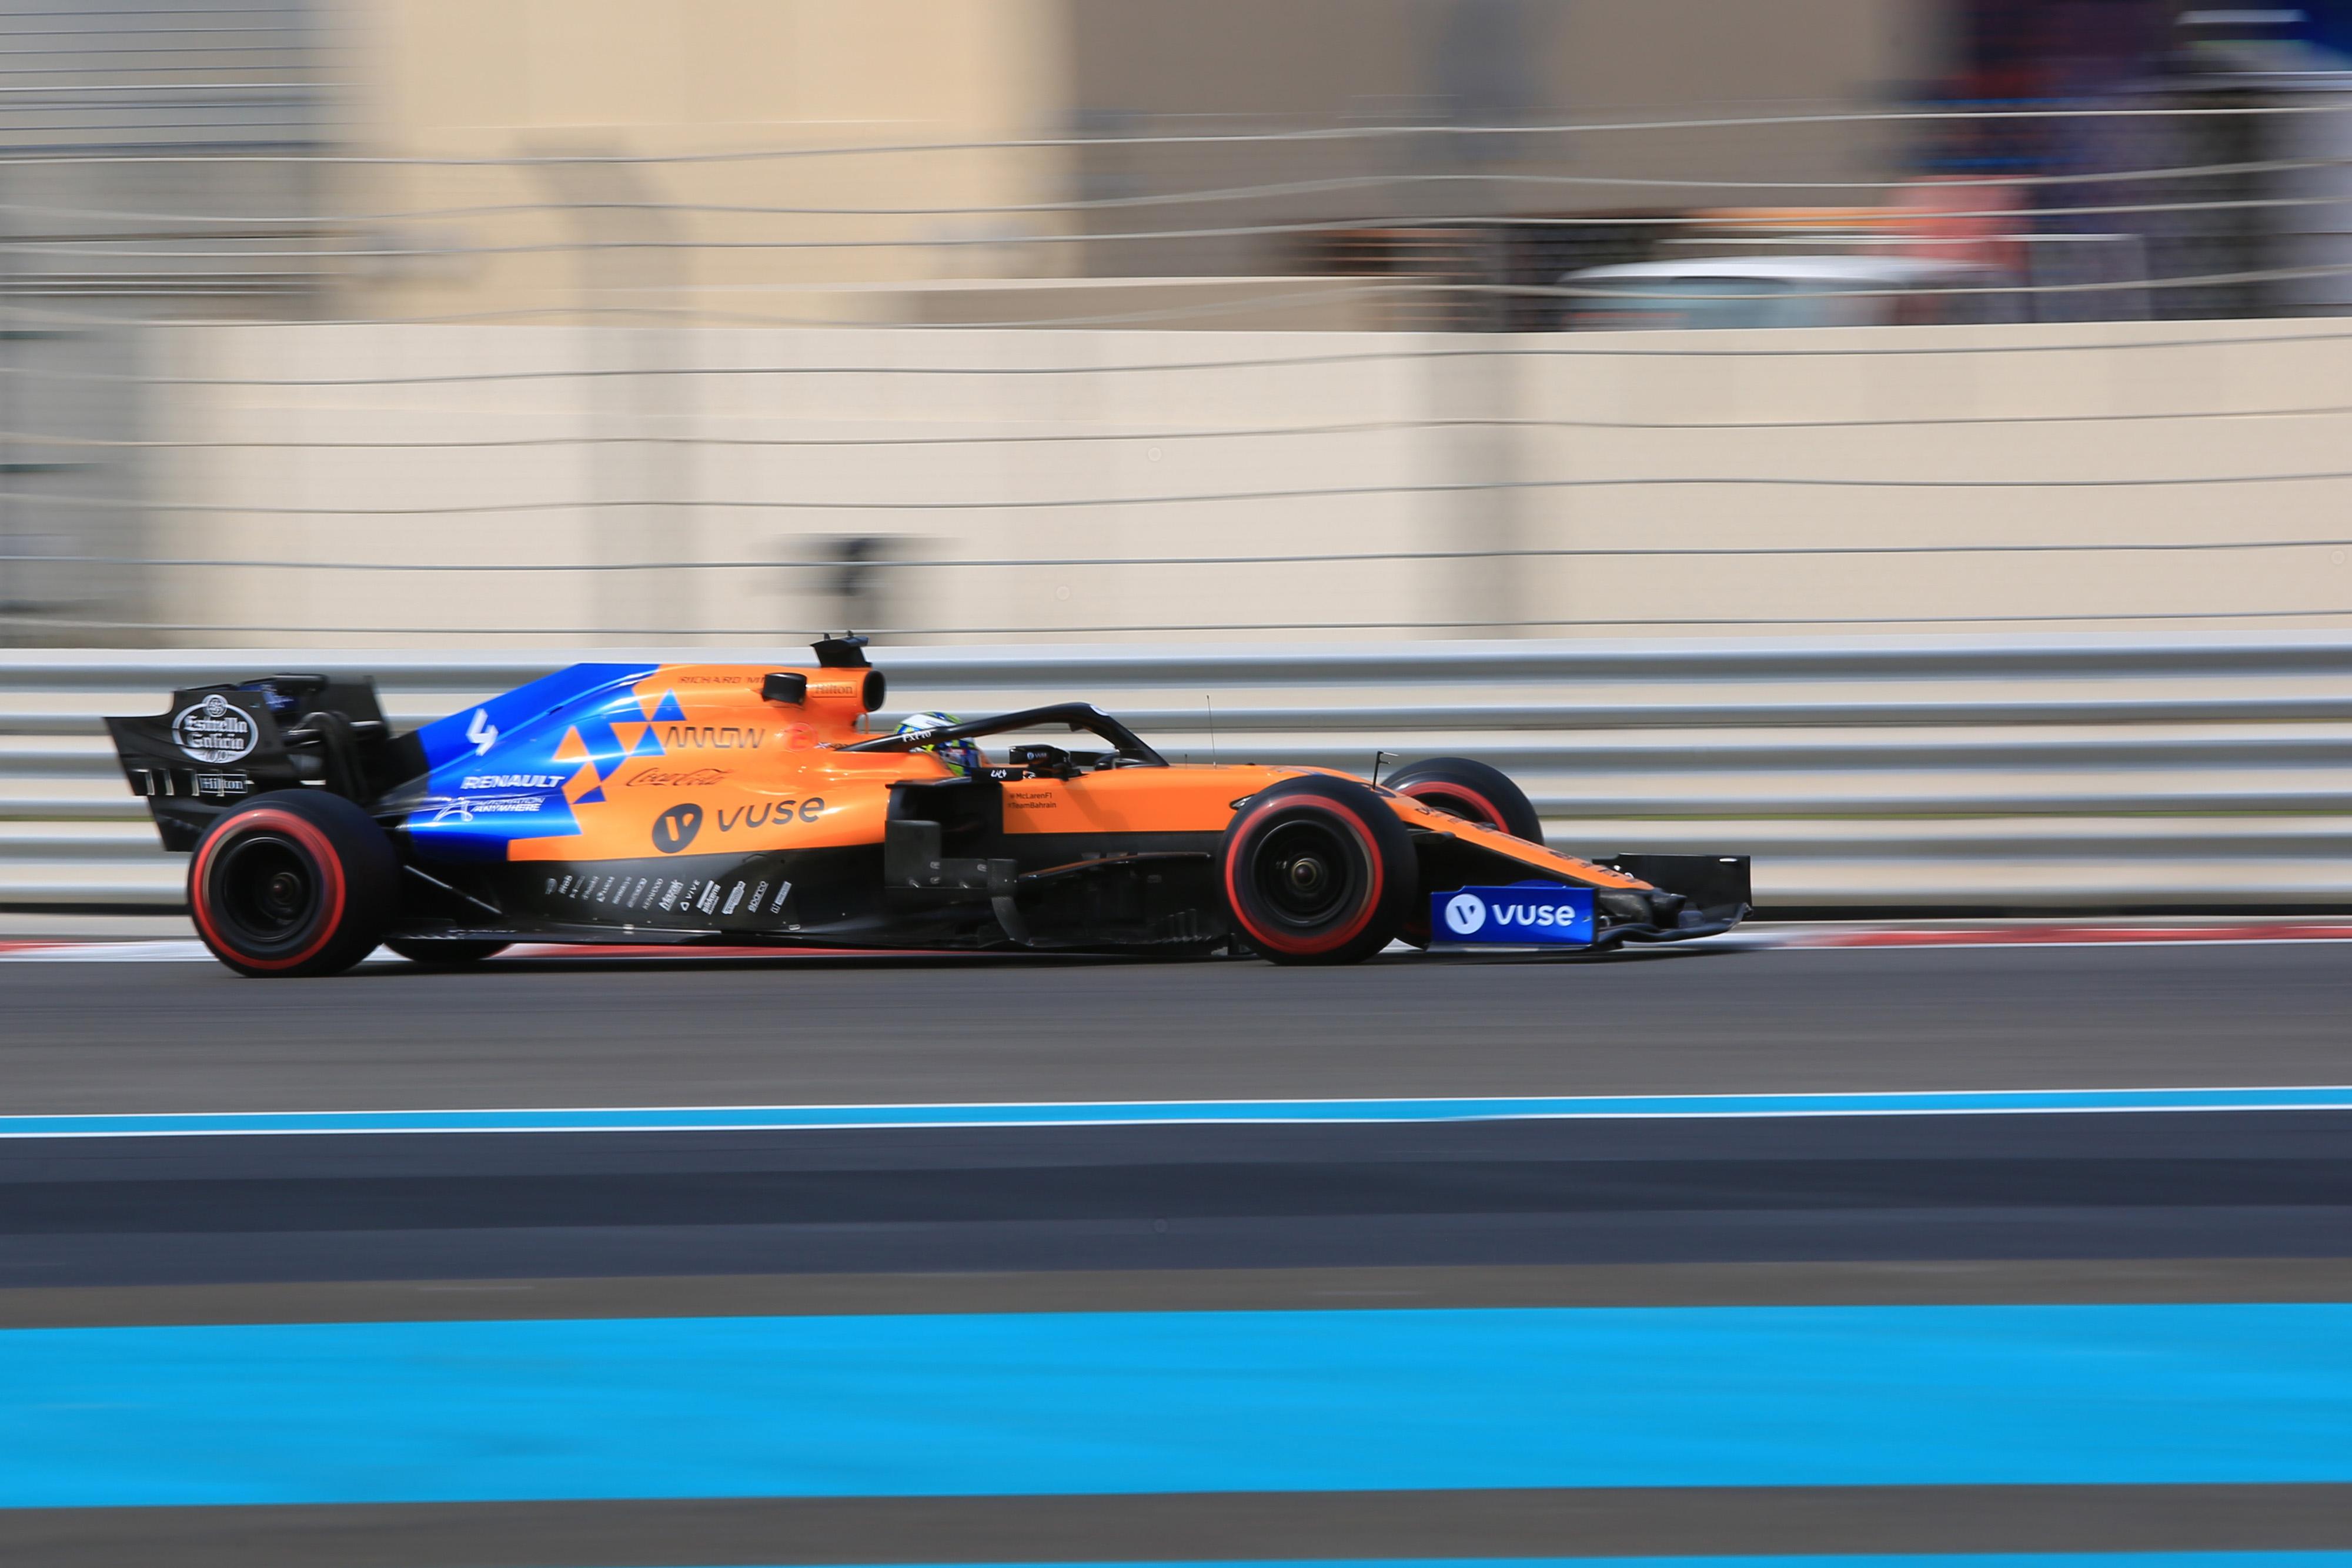 F1 Formula 1 Formula One Testing Pirelli Yas Marina Lando Norris McLaren different driving styles